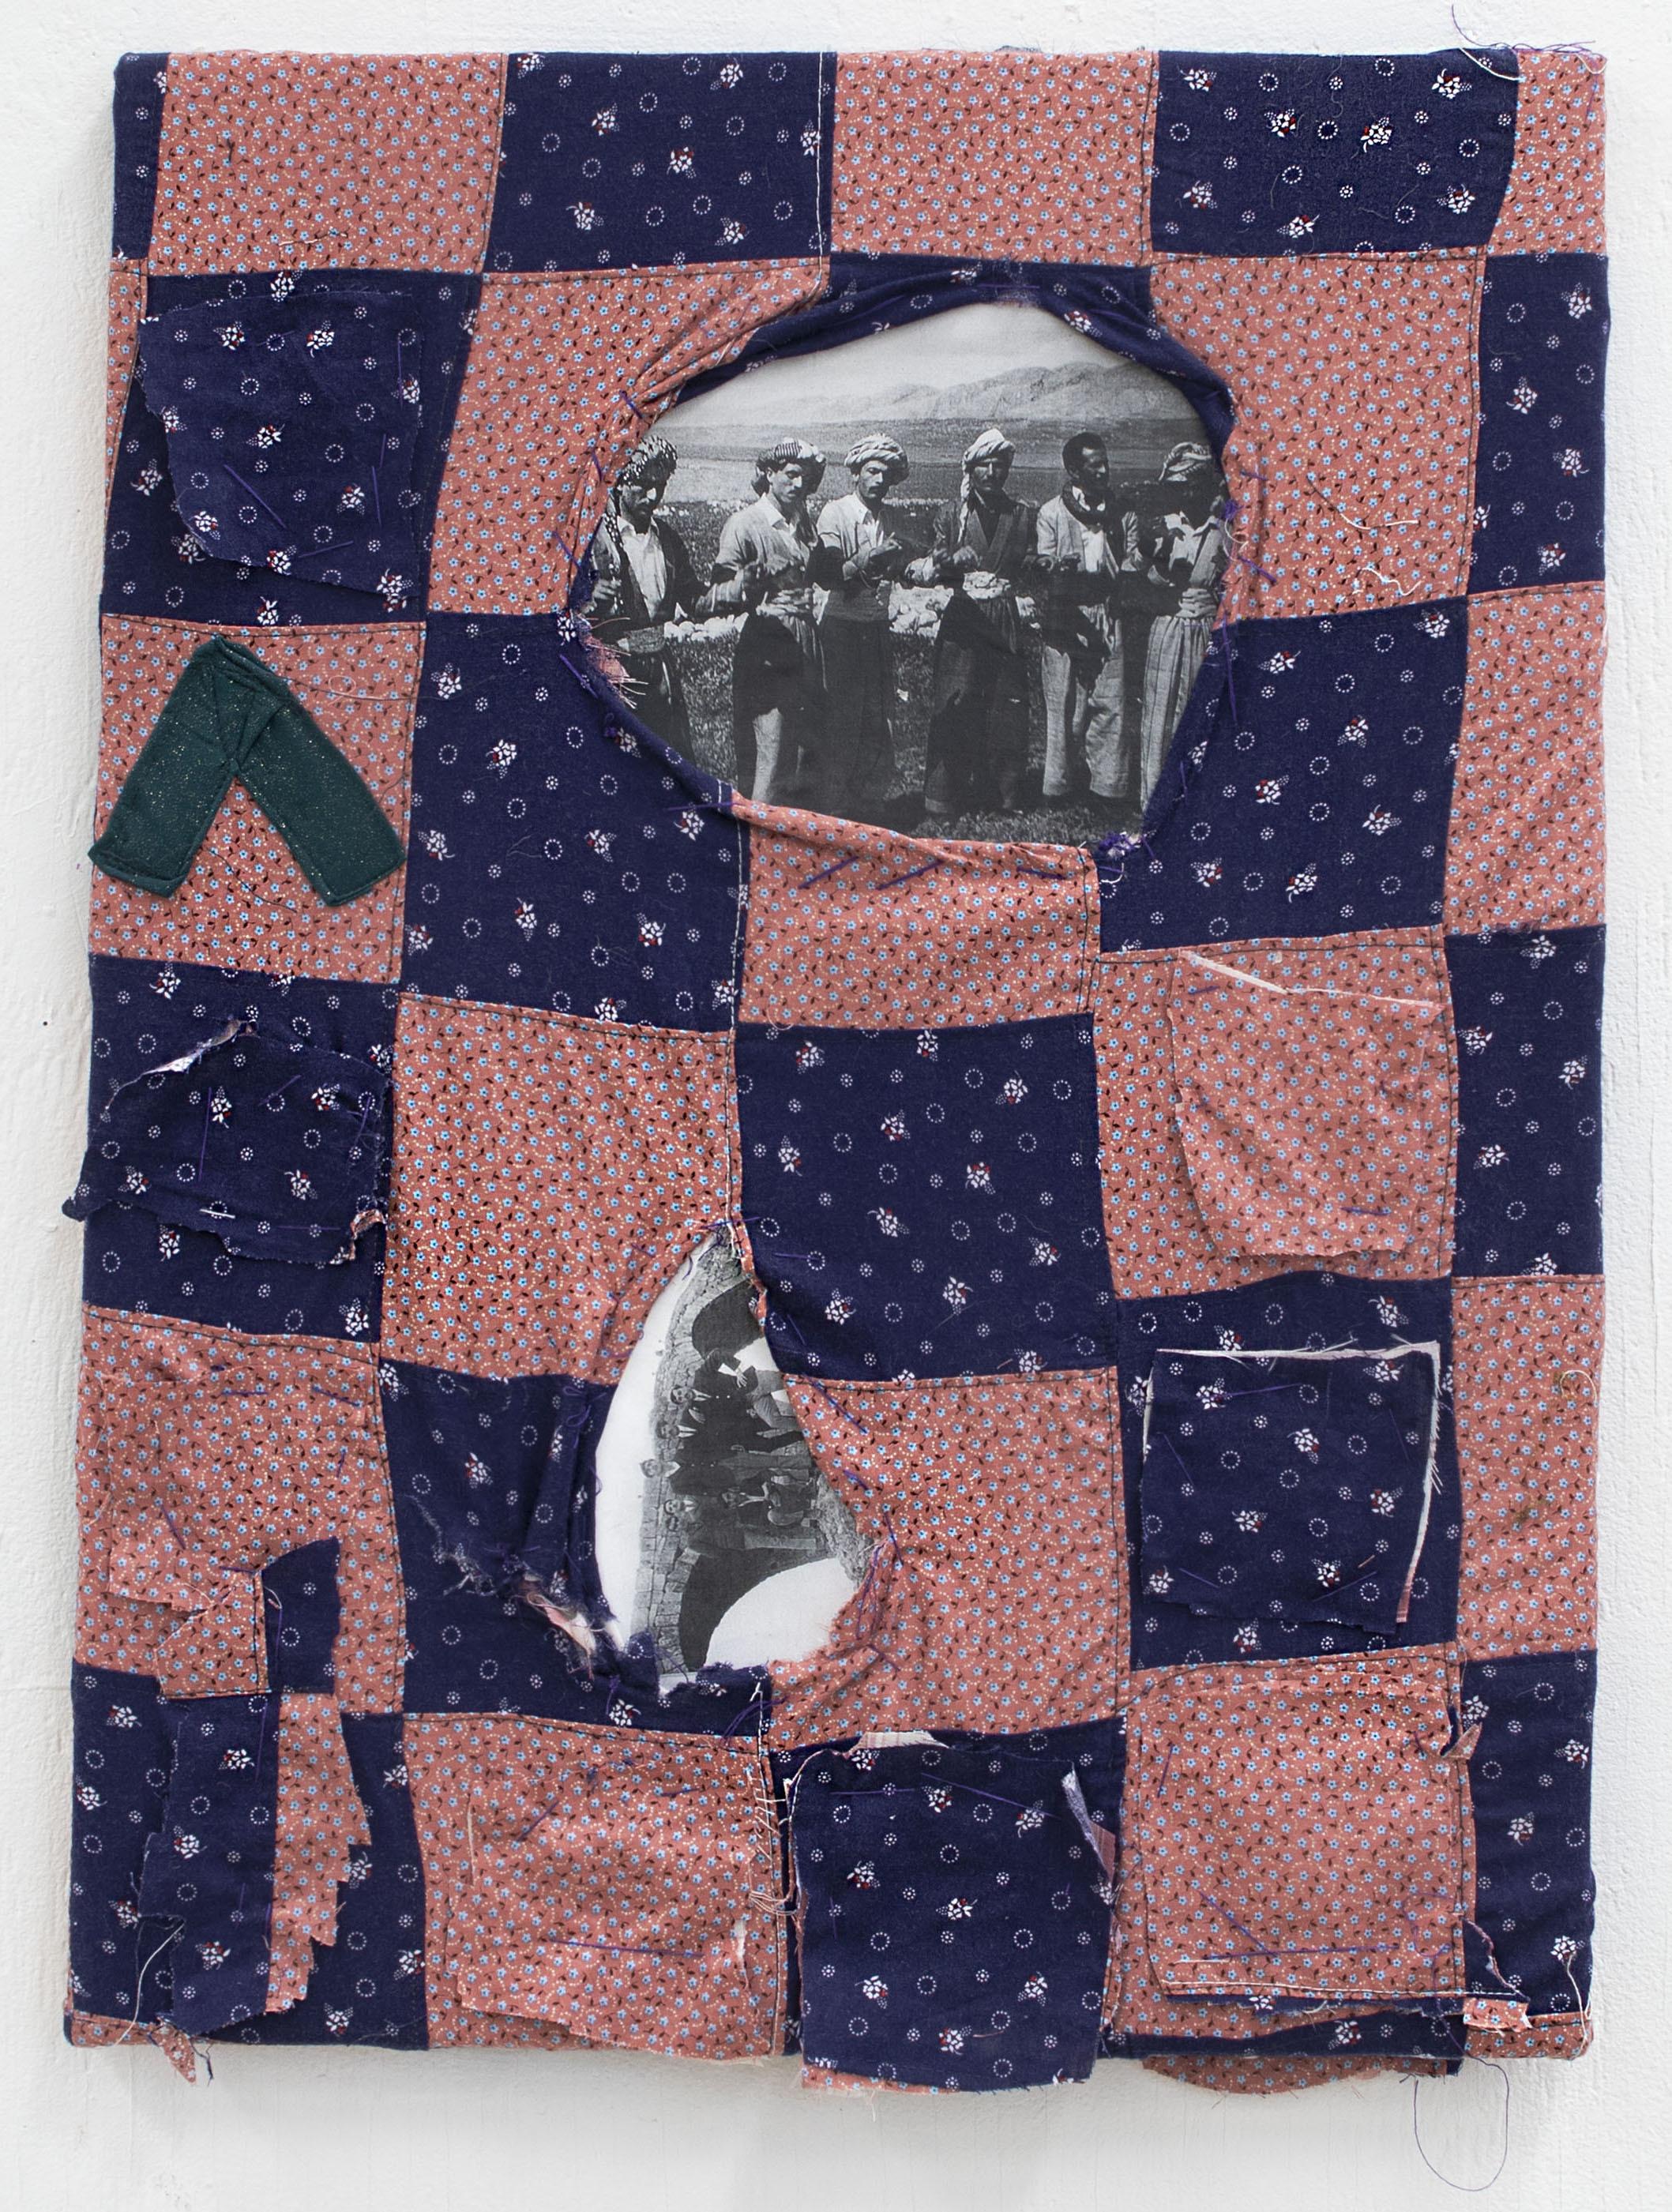 "Nuveen Barwari, Back to the land, found fabric, thread, canvas, xerox, 18"" x 24"", 2021"